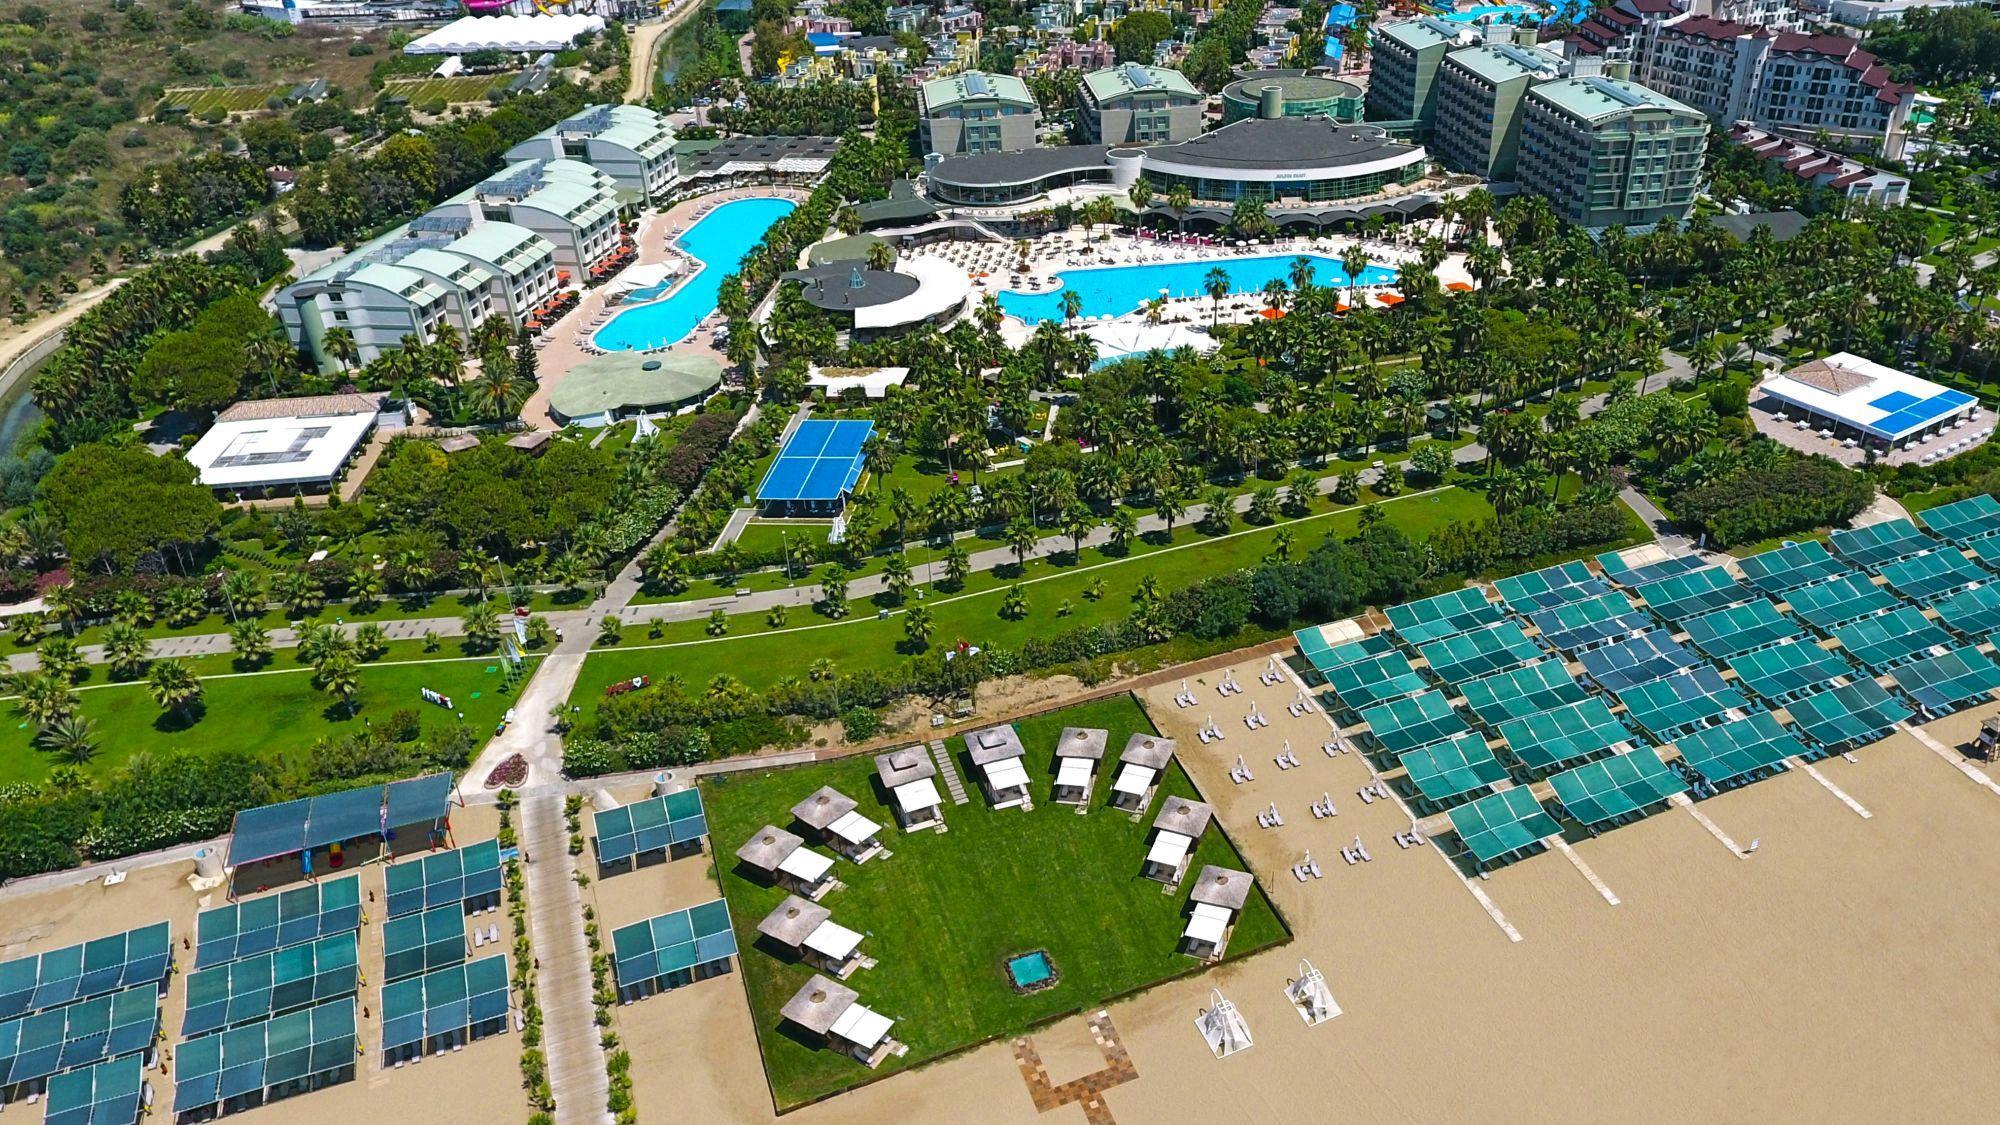 http://www.orextravel.sk/OREX/hotelphotos/vonresort-golden-coast-general-003.jpg